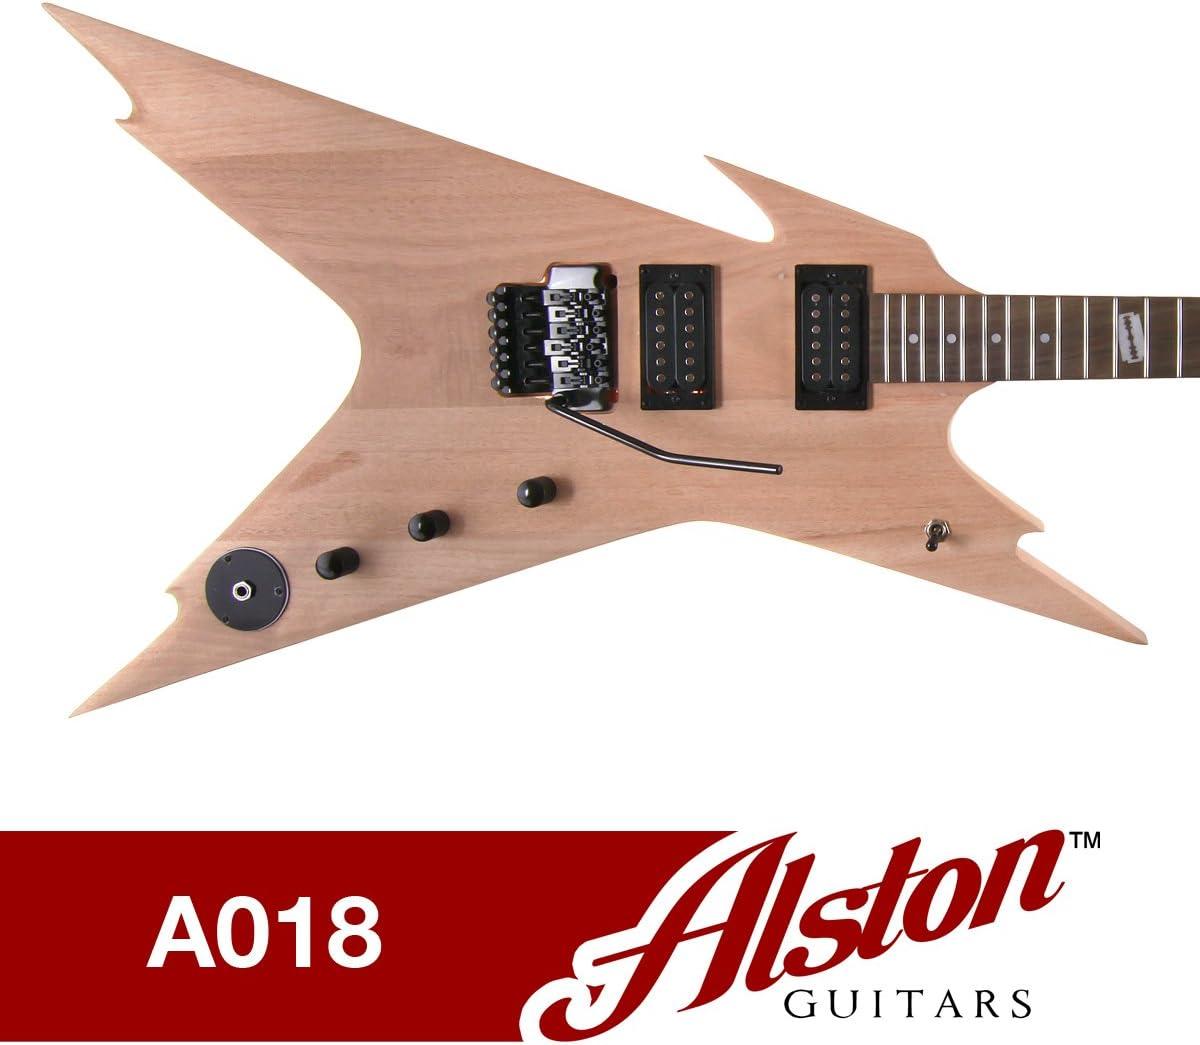 [SCHEMATICS_44OR]  Amazon.com: Alston Guitars - DIY Electric Guitar Kit | Bolt On Neck | Solid  Mahogany & Neck | A018: Musical Instruments | Alston Guitars Kit Wiring Diagram |  | Amazon.com